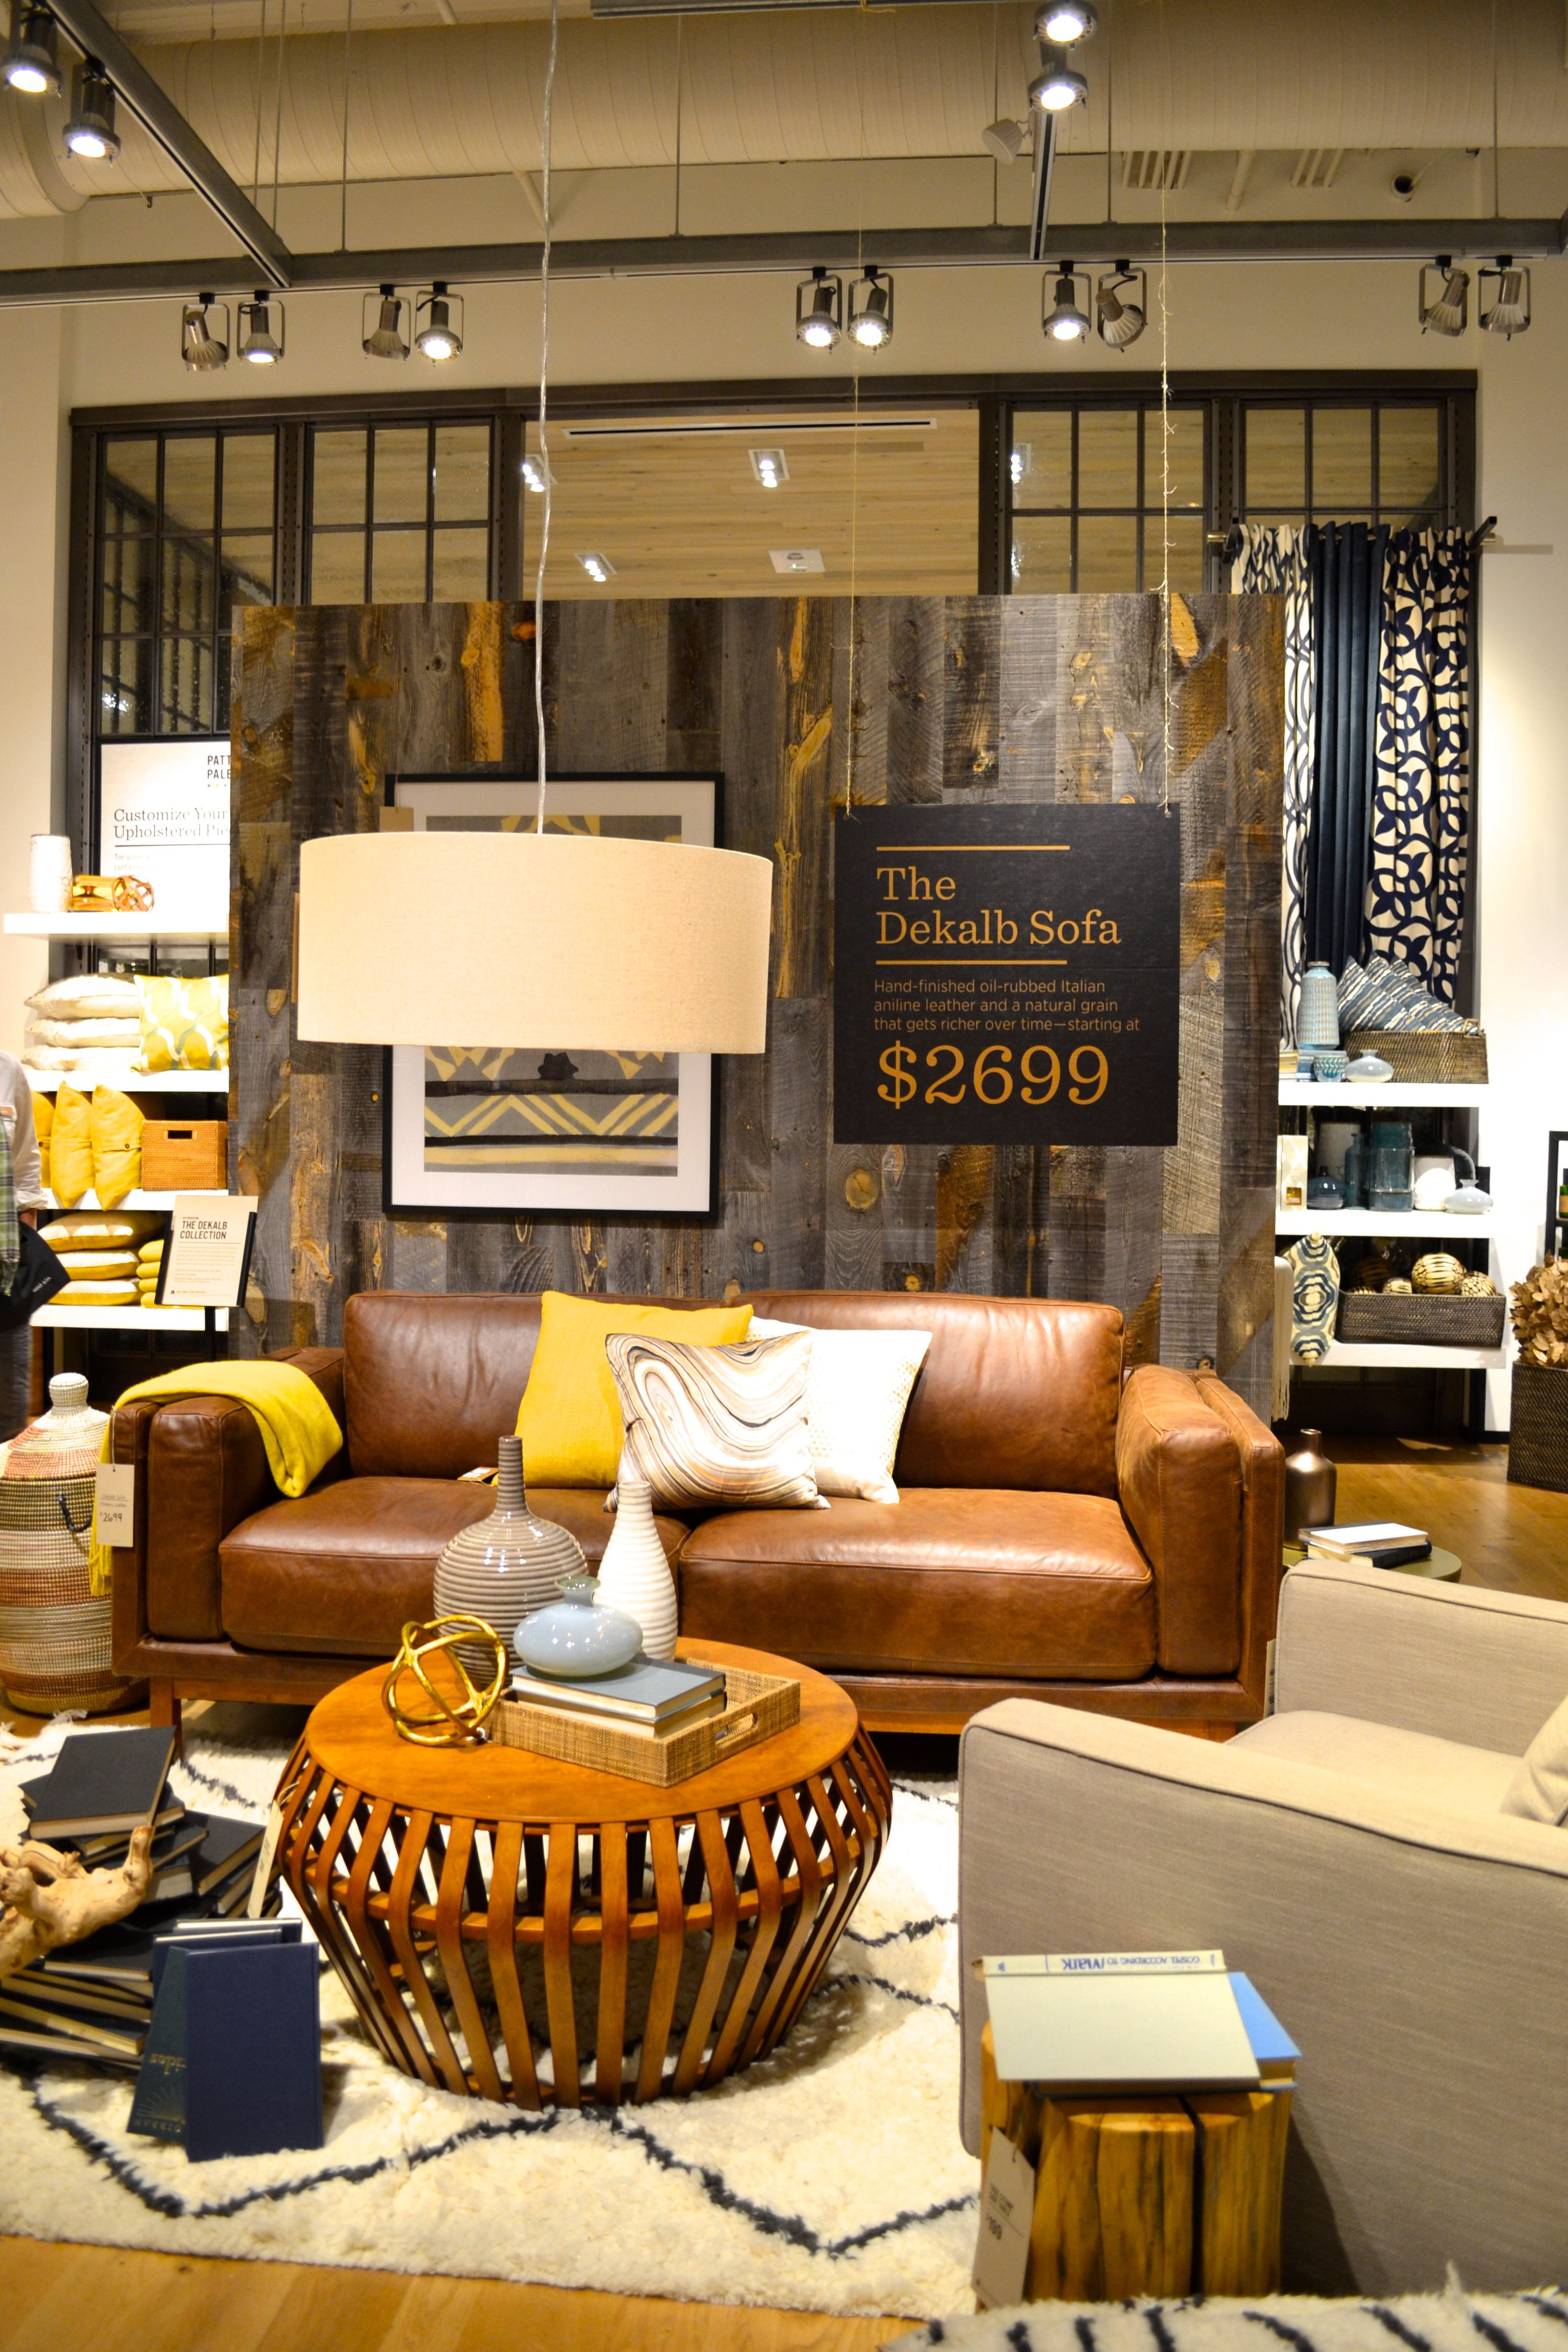 trend decoration awesome west elm stores pa stores like west elm and crate and barrel stores. Black Bedroom Furniture Sets. Home Design Ideas